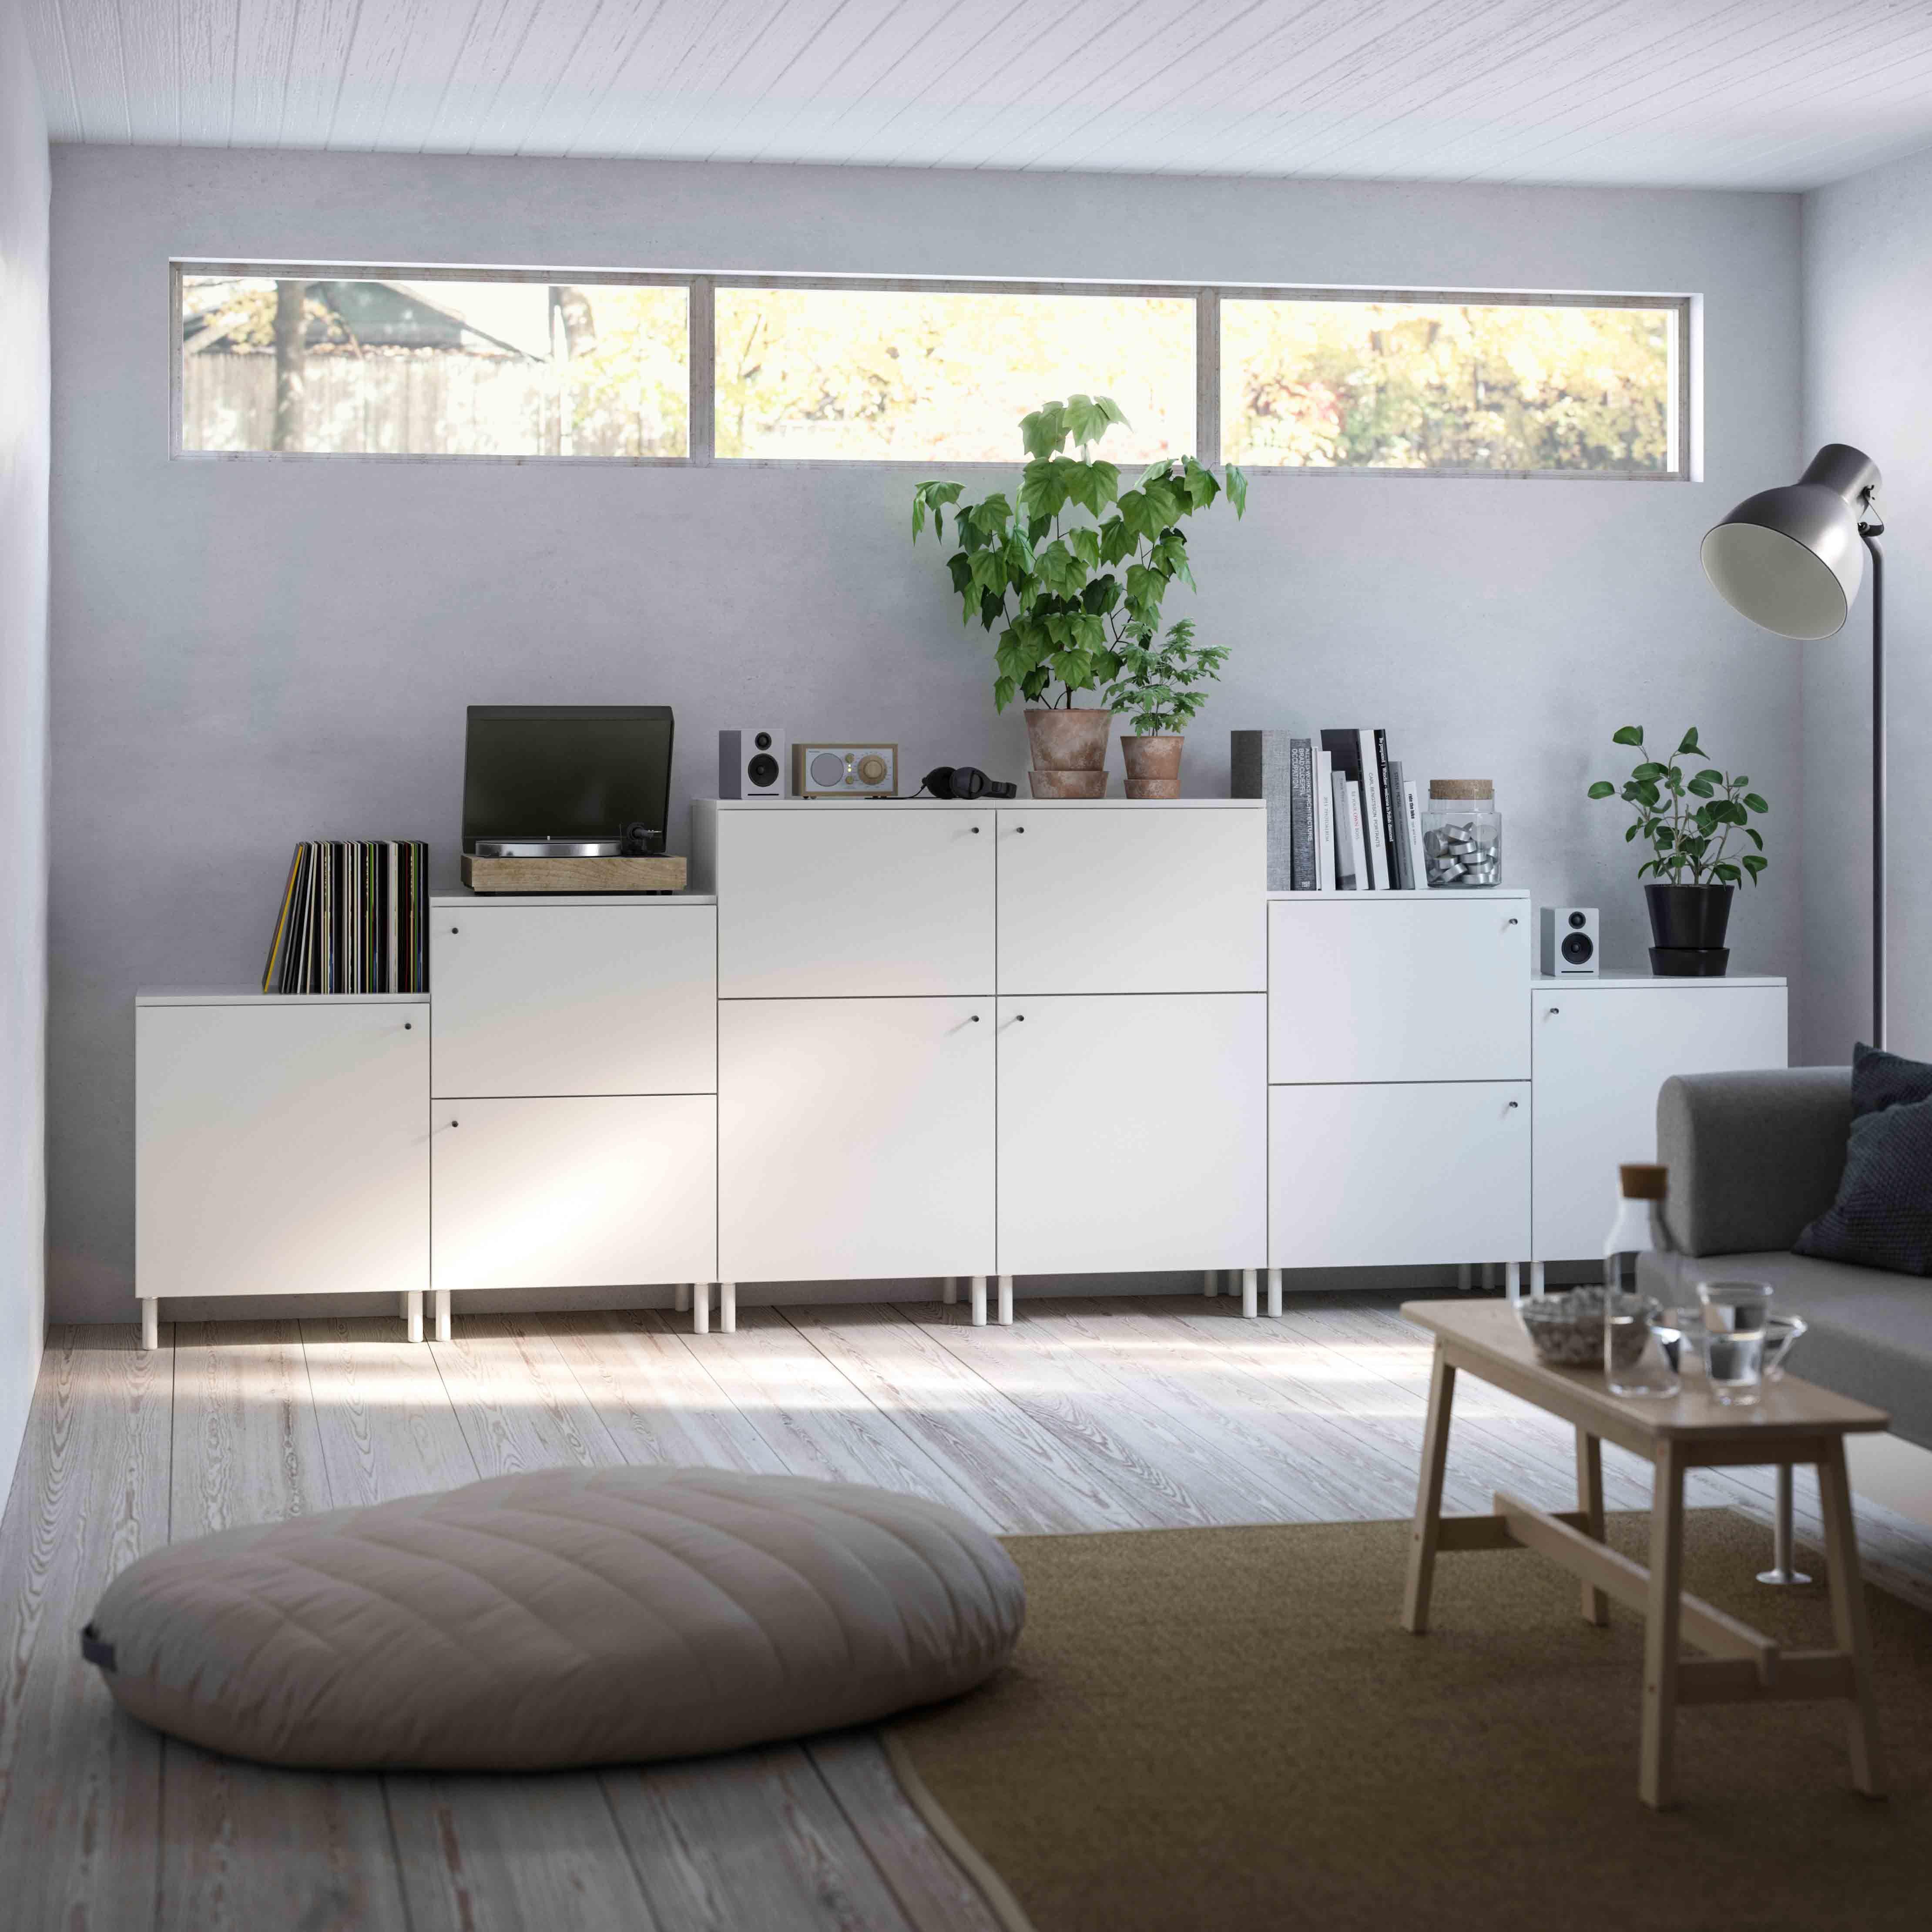 Ikea PLATSA Range   Storage System Using Wedge Dowel Technology